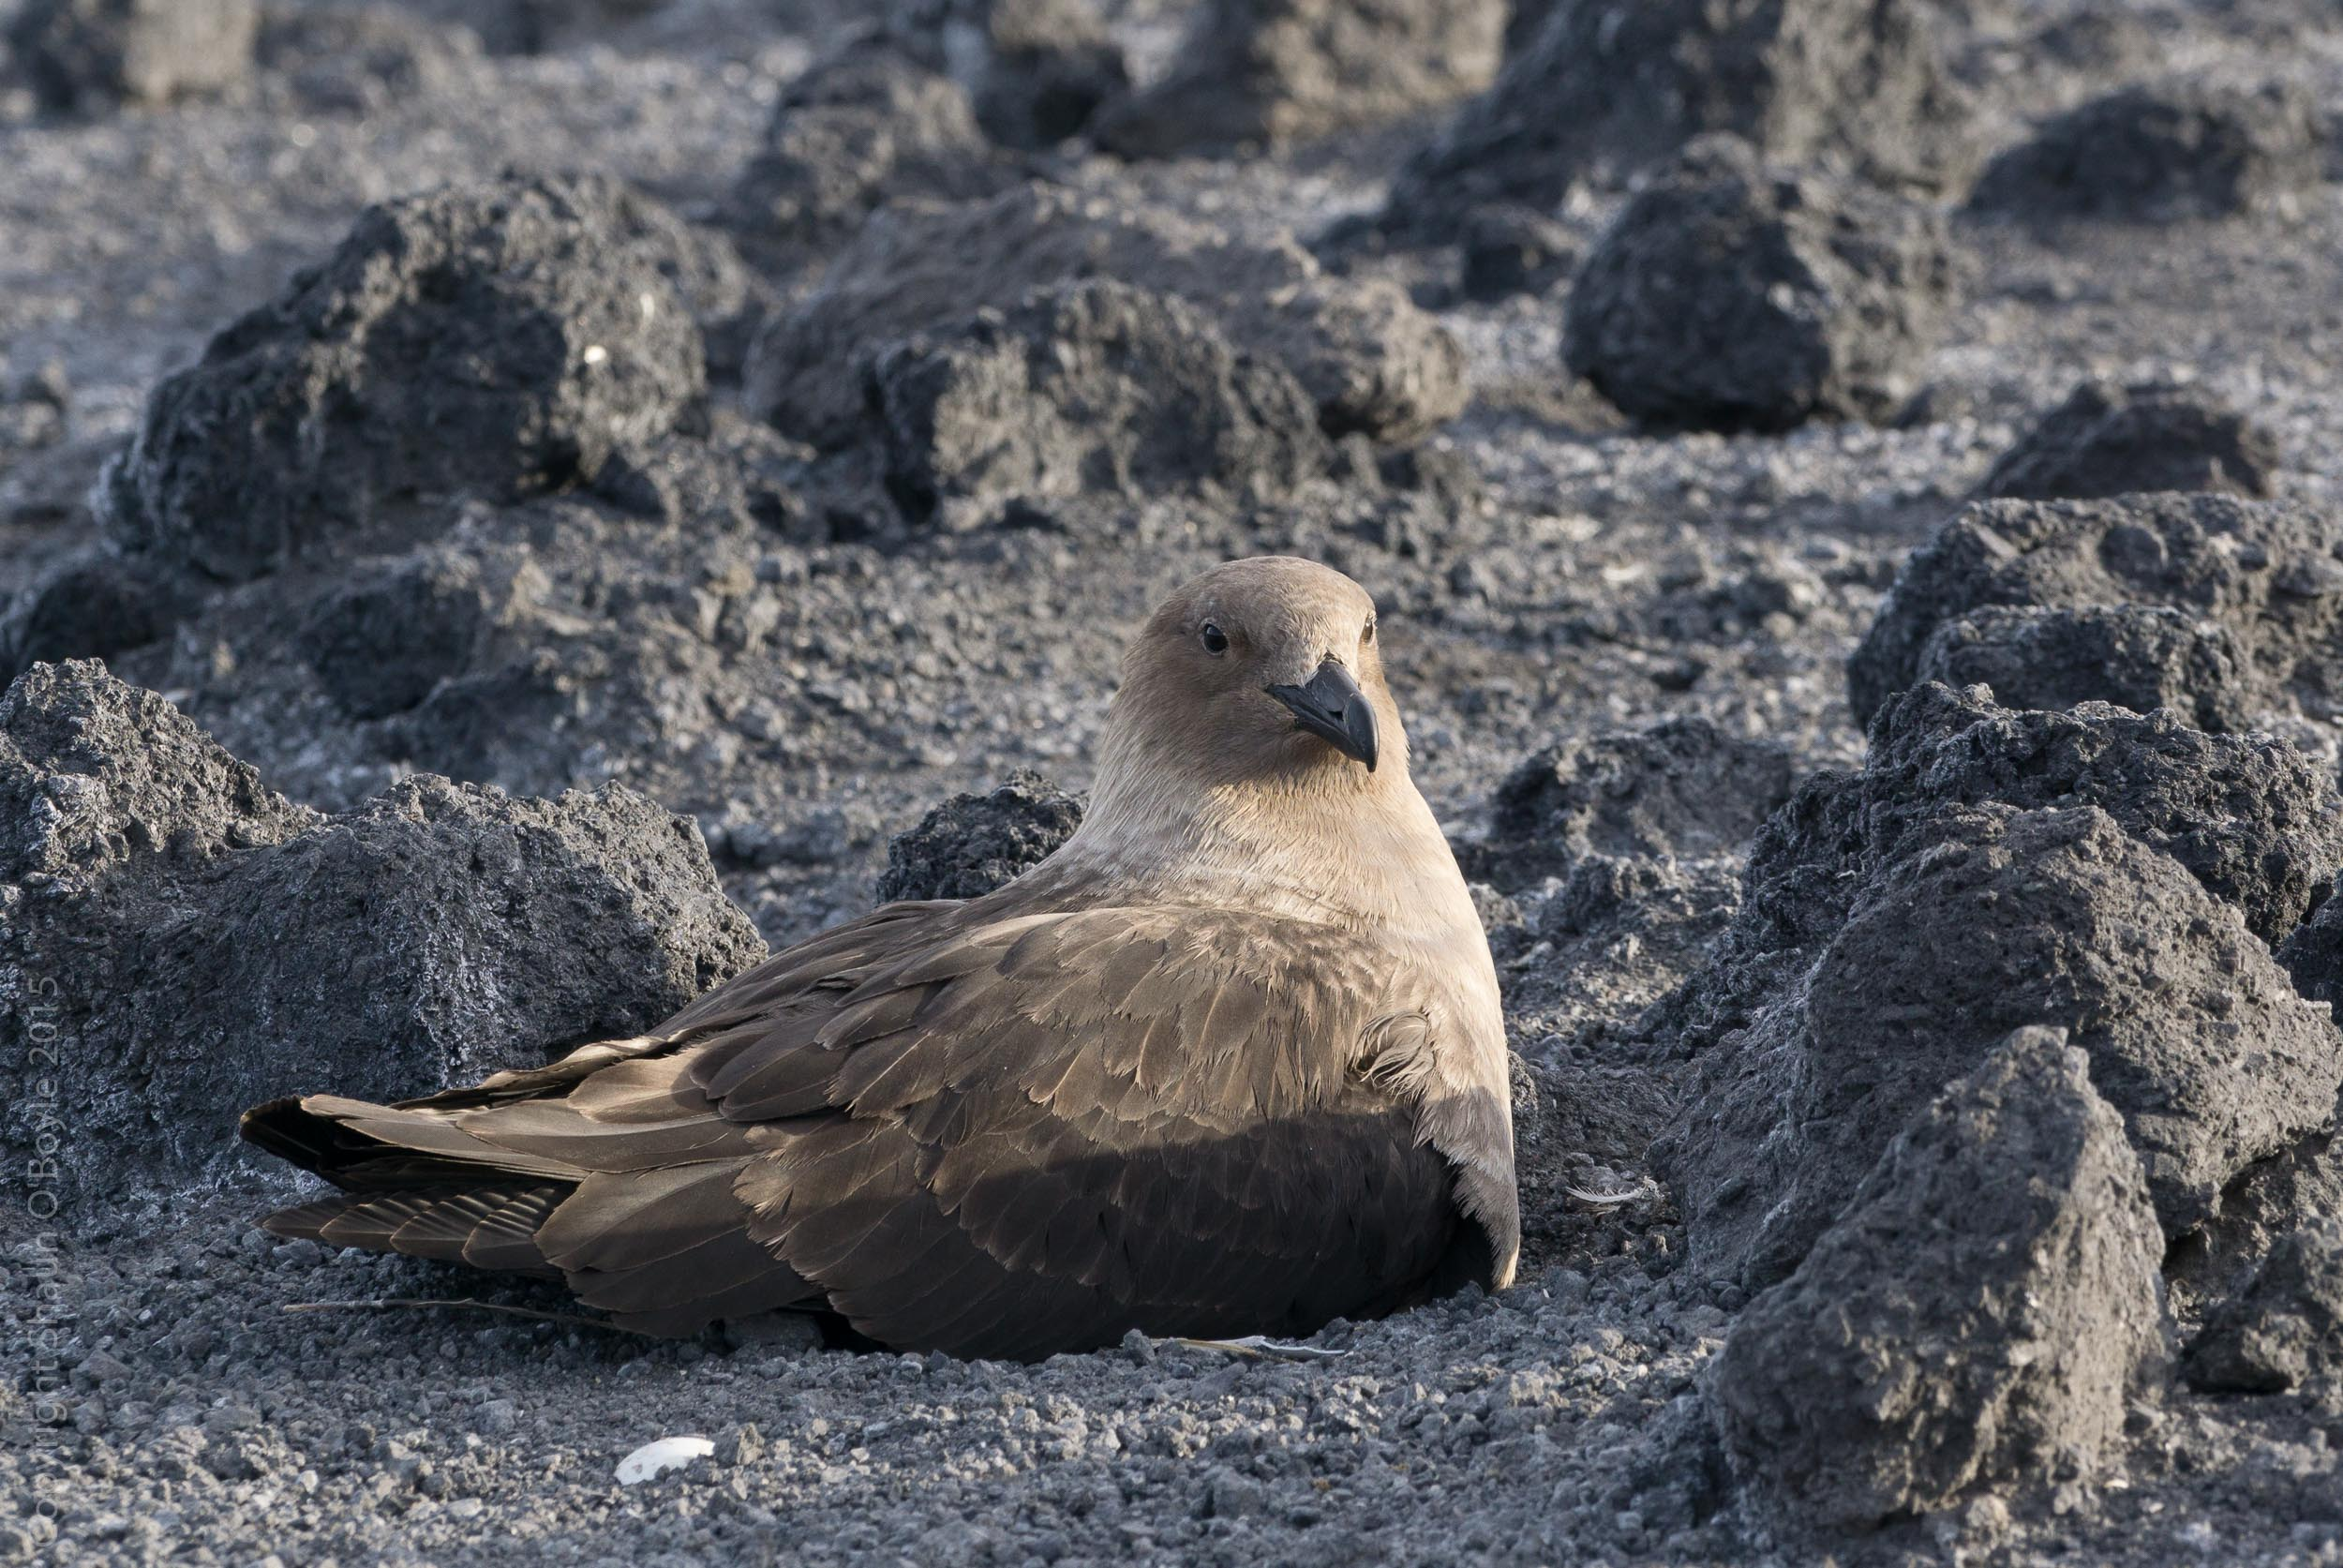 Skua, a bird that preys on the penguin colony